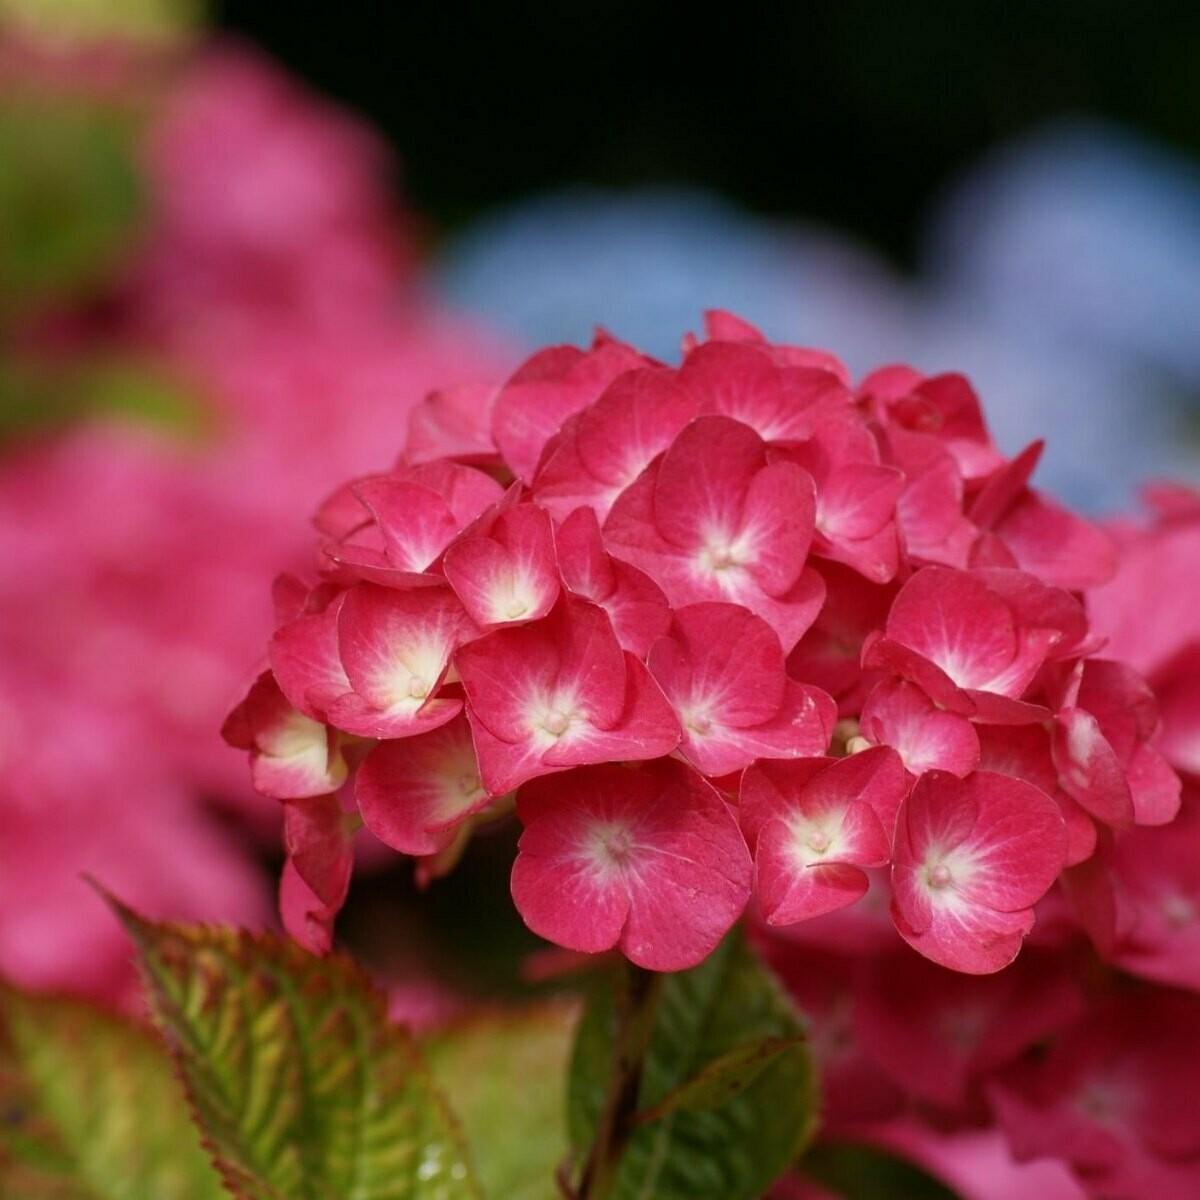 Tinted - Hydrangea hot pink